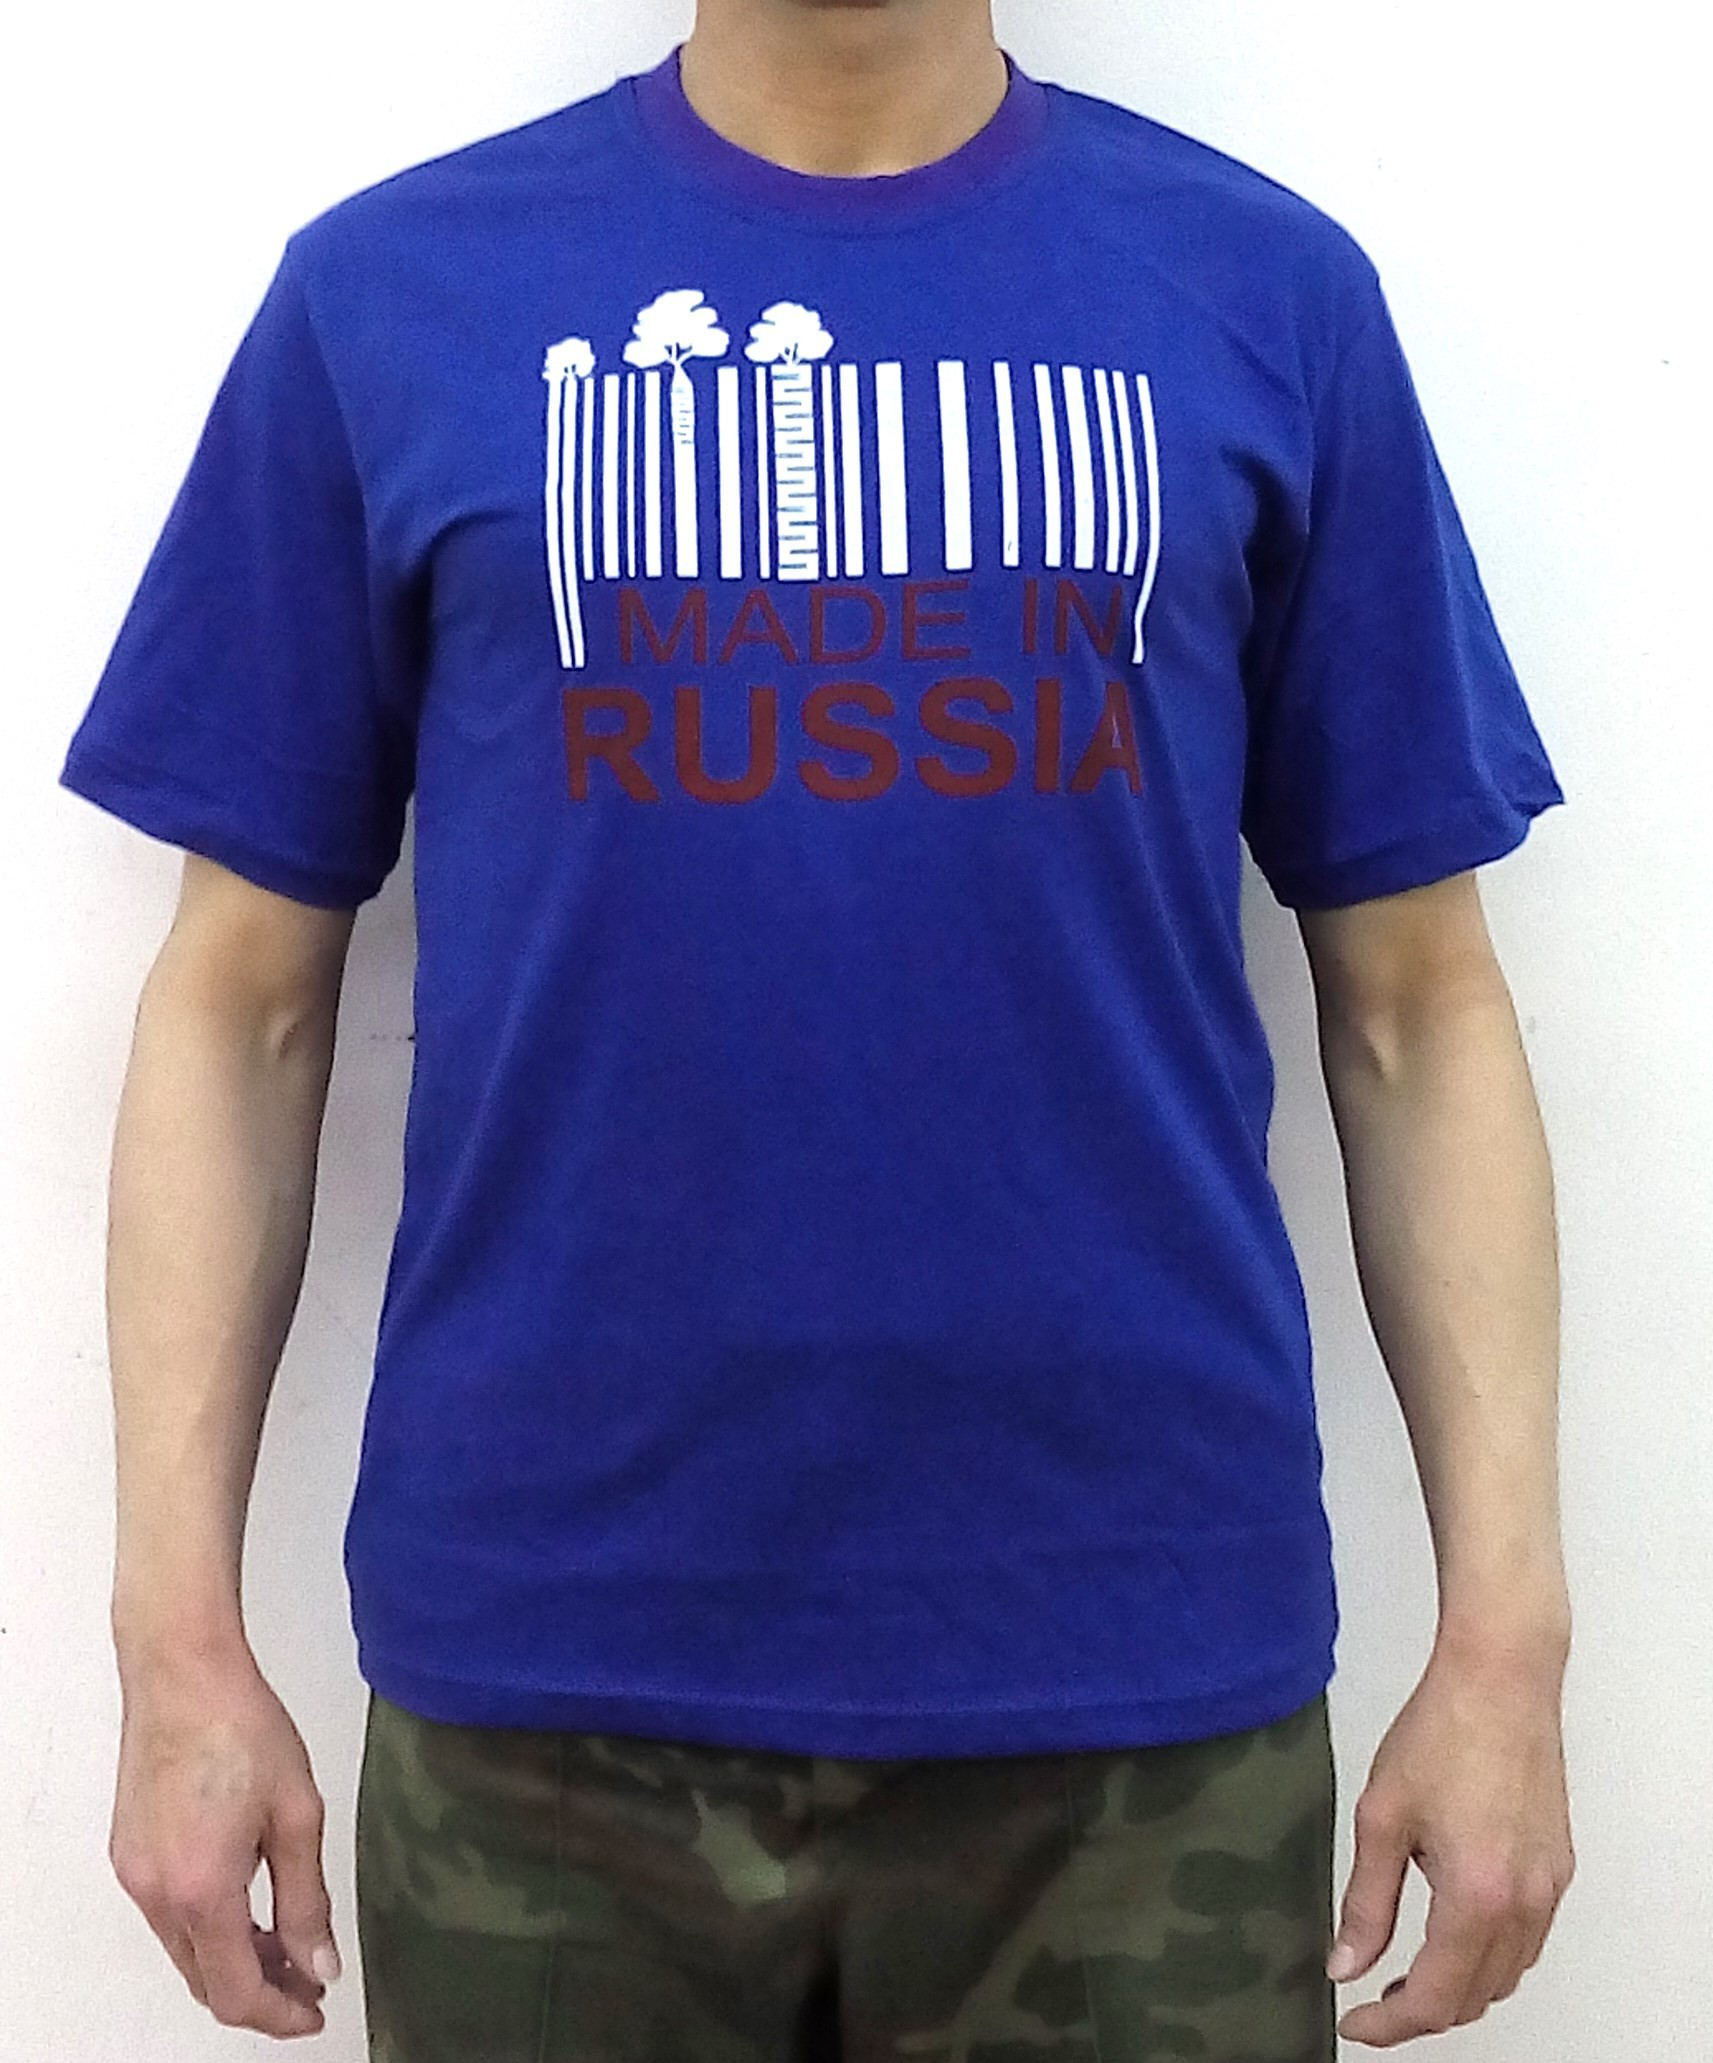 Футболка мужская RussiaФутболки<br><br><br>Размер: 46